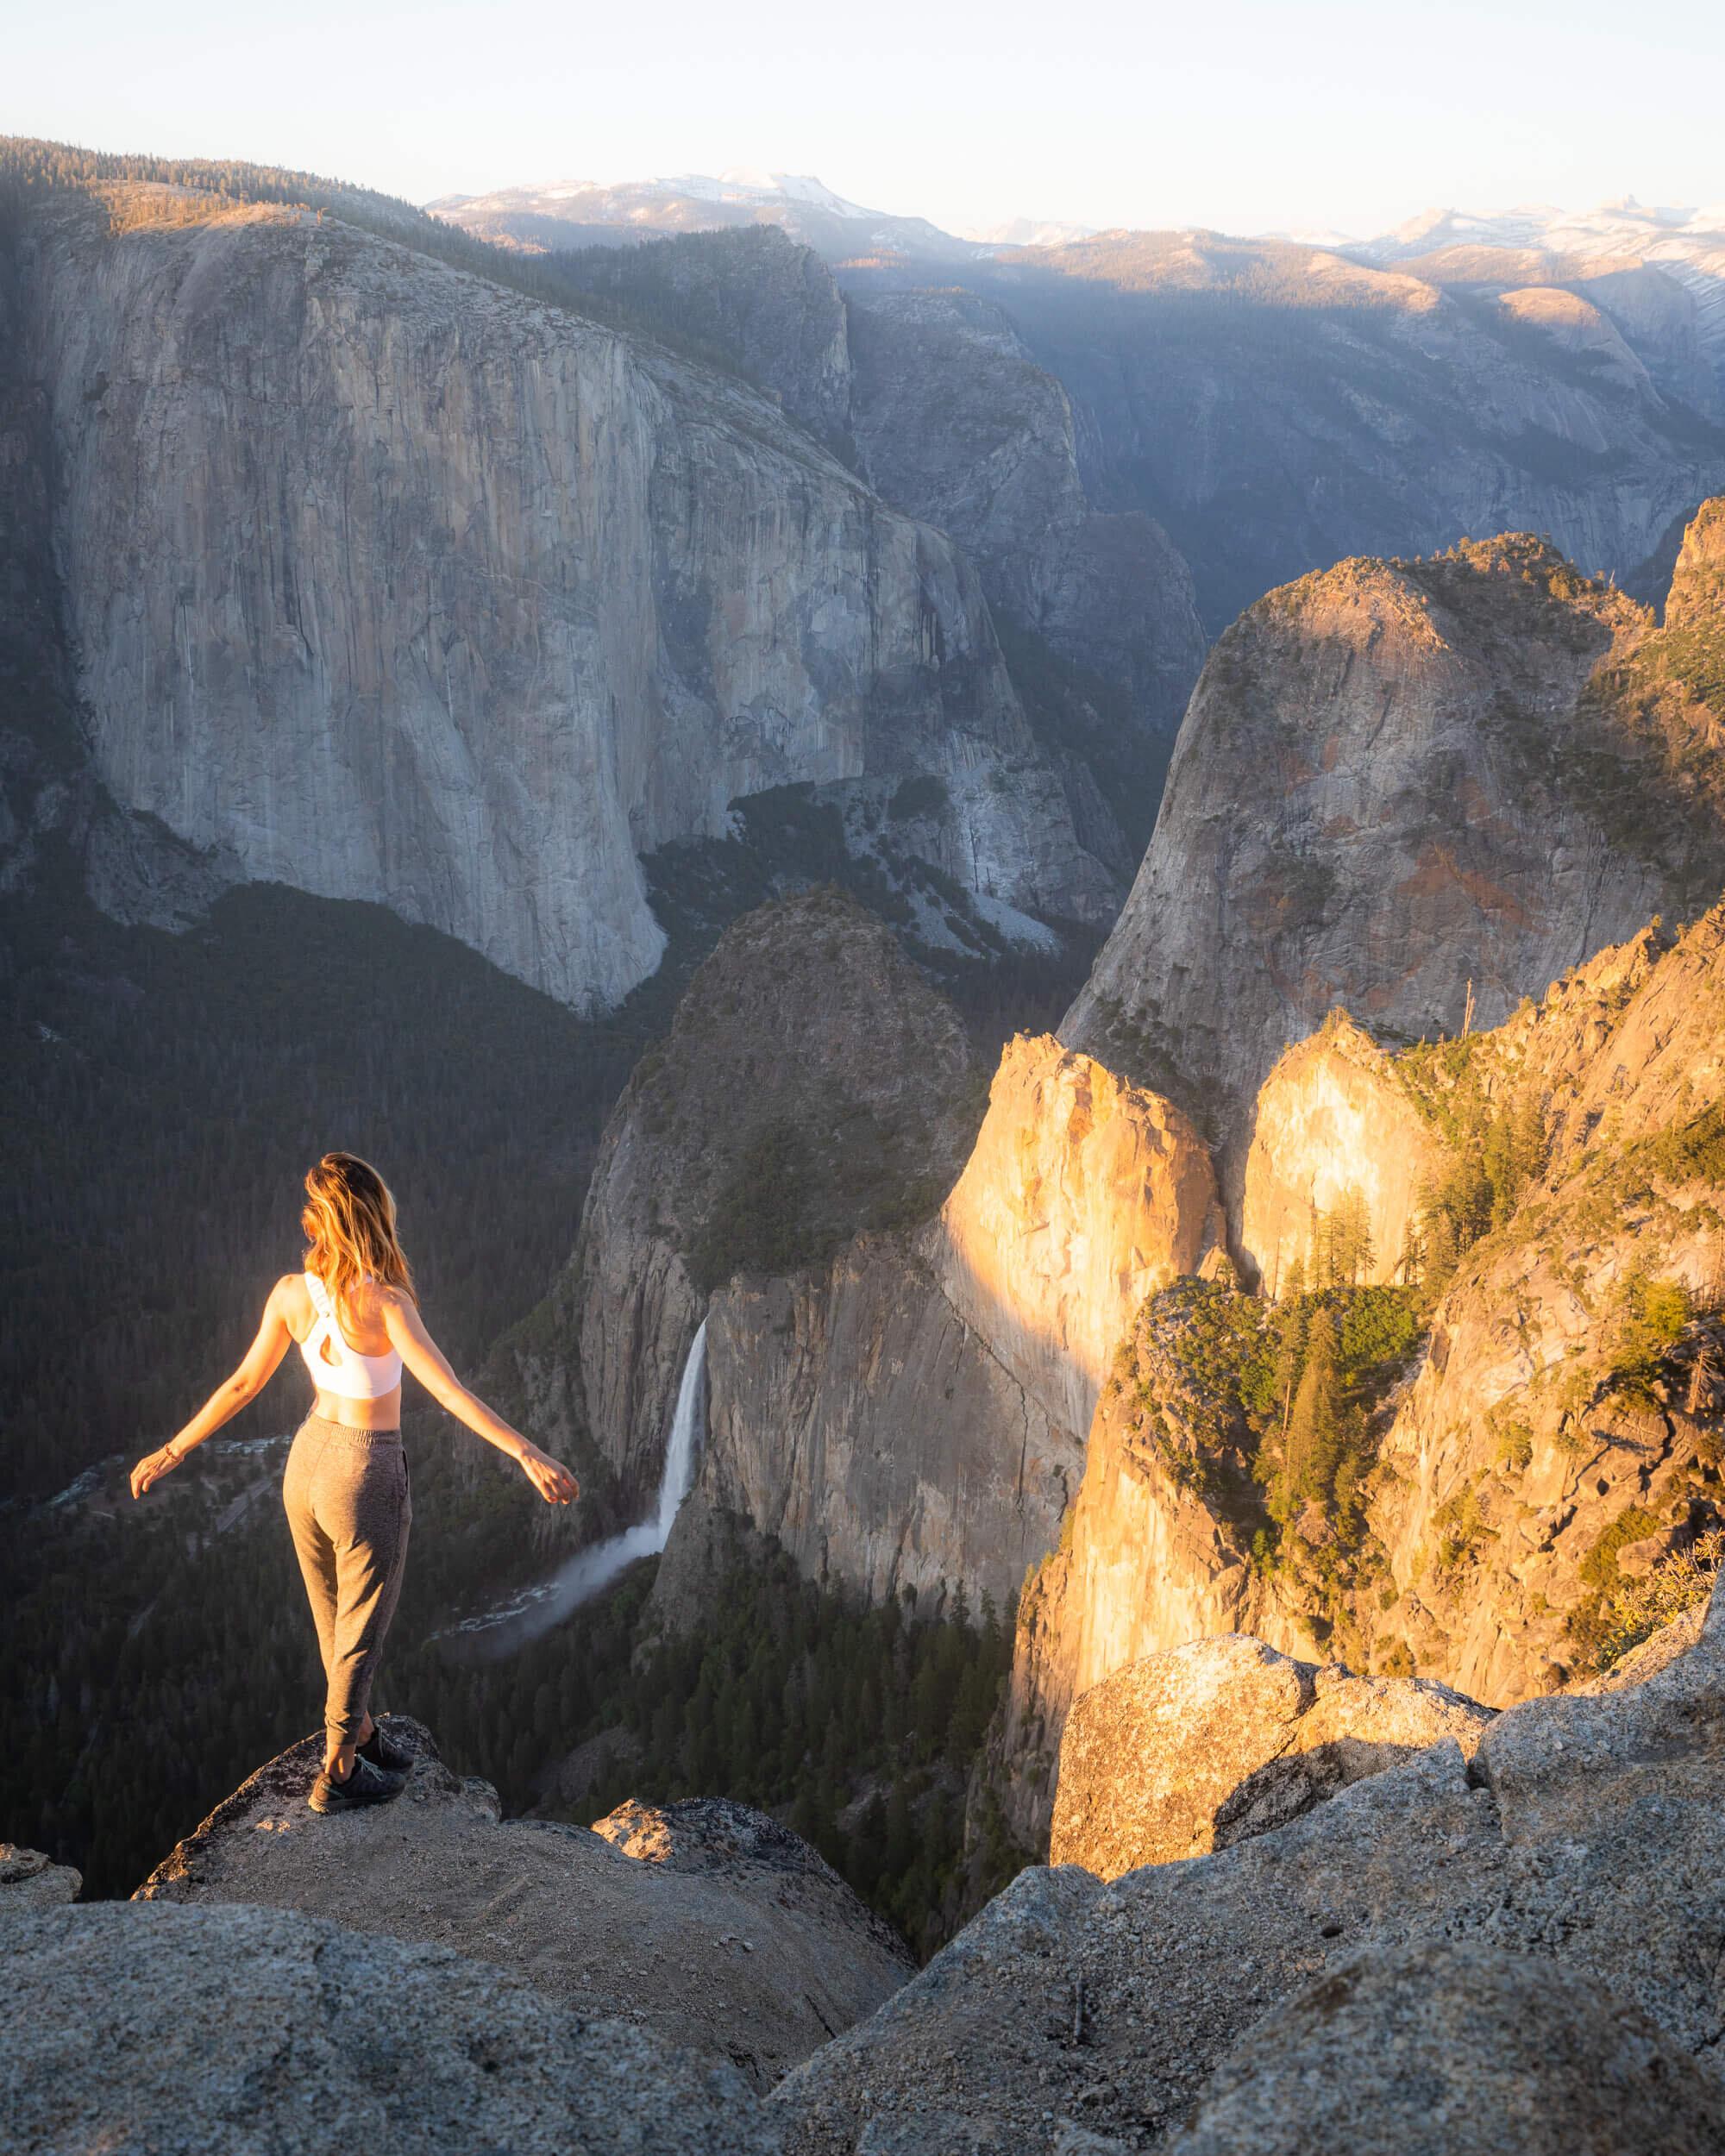 Pohono Trail in Yosemite National Park.